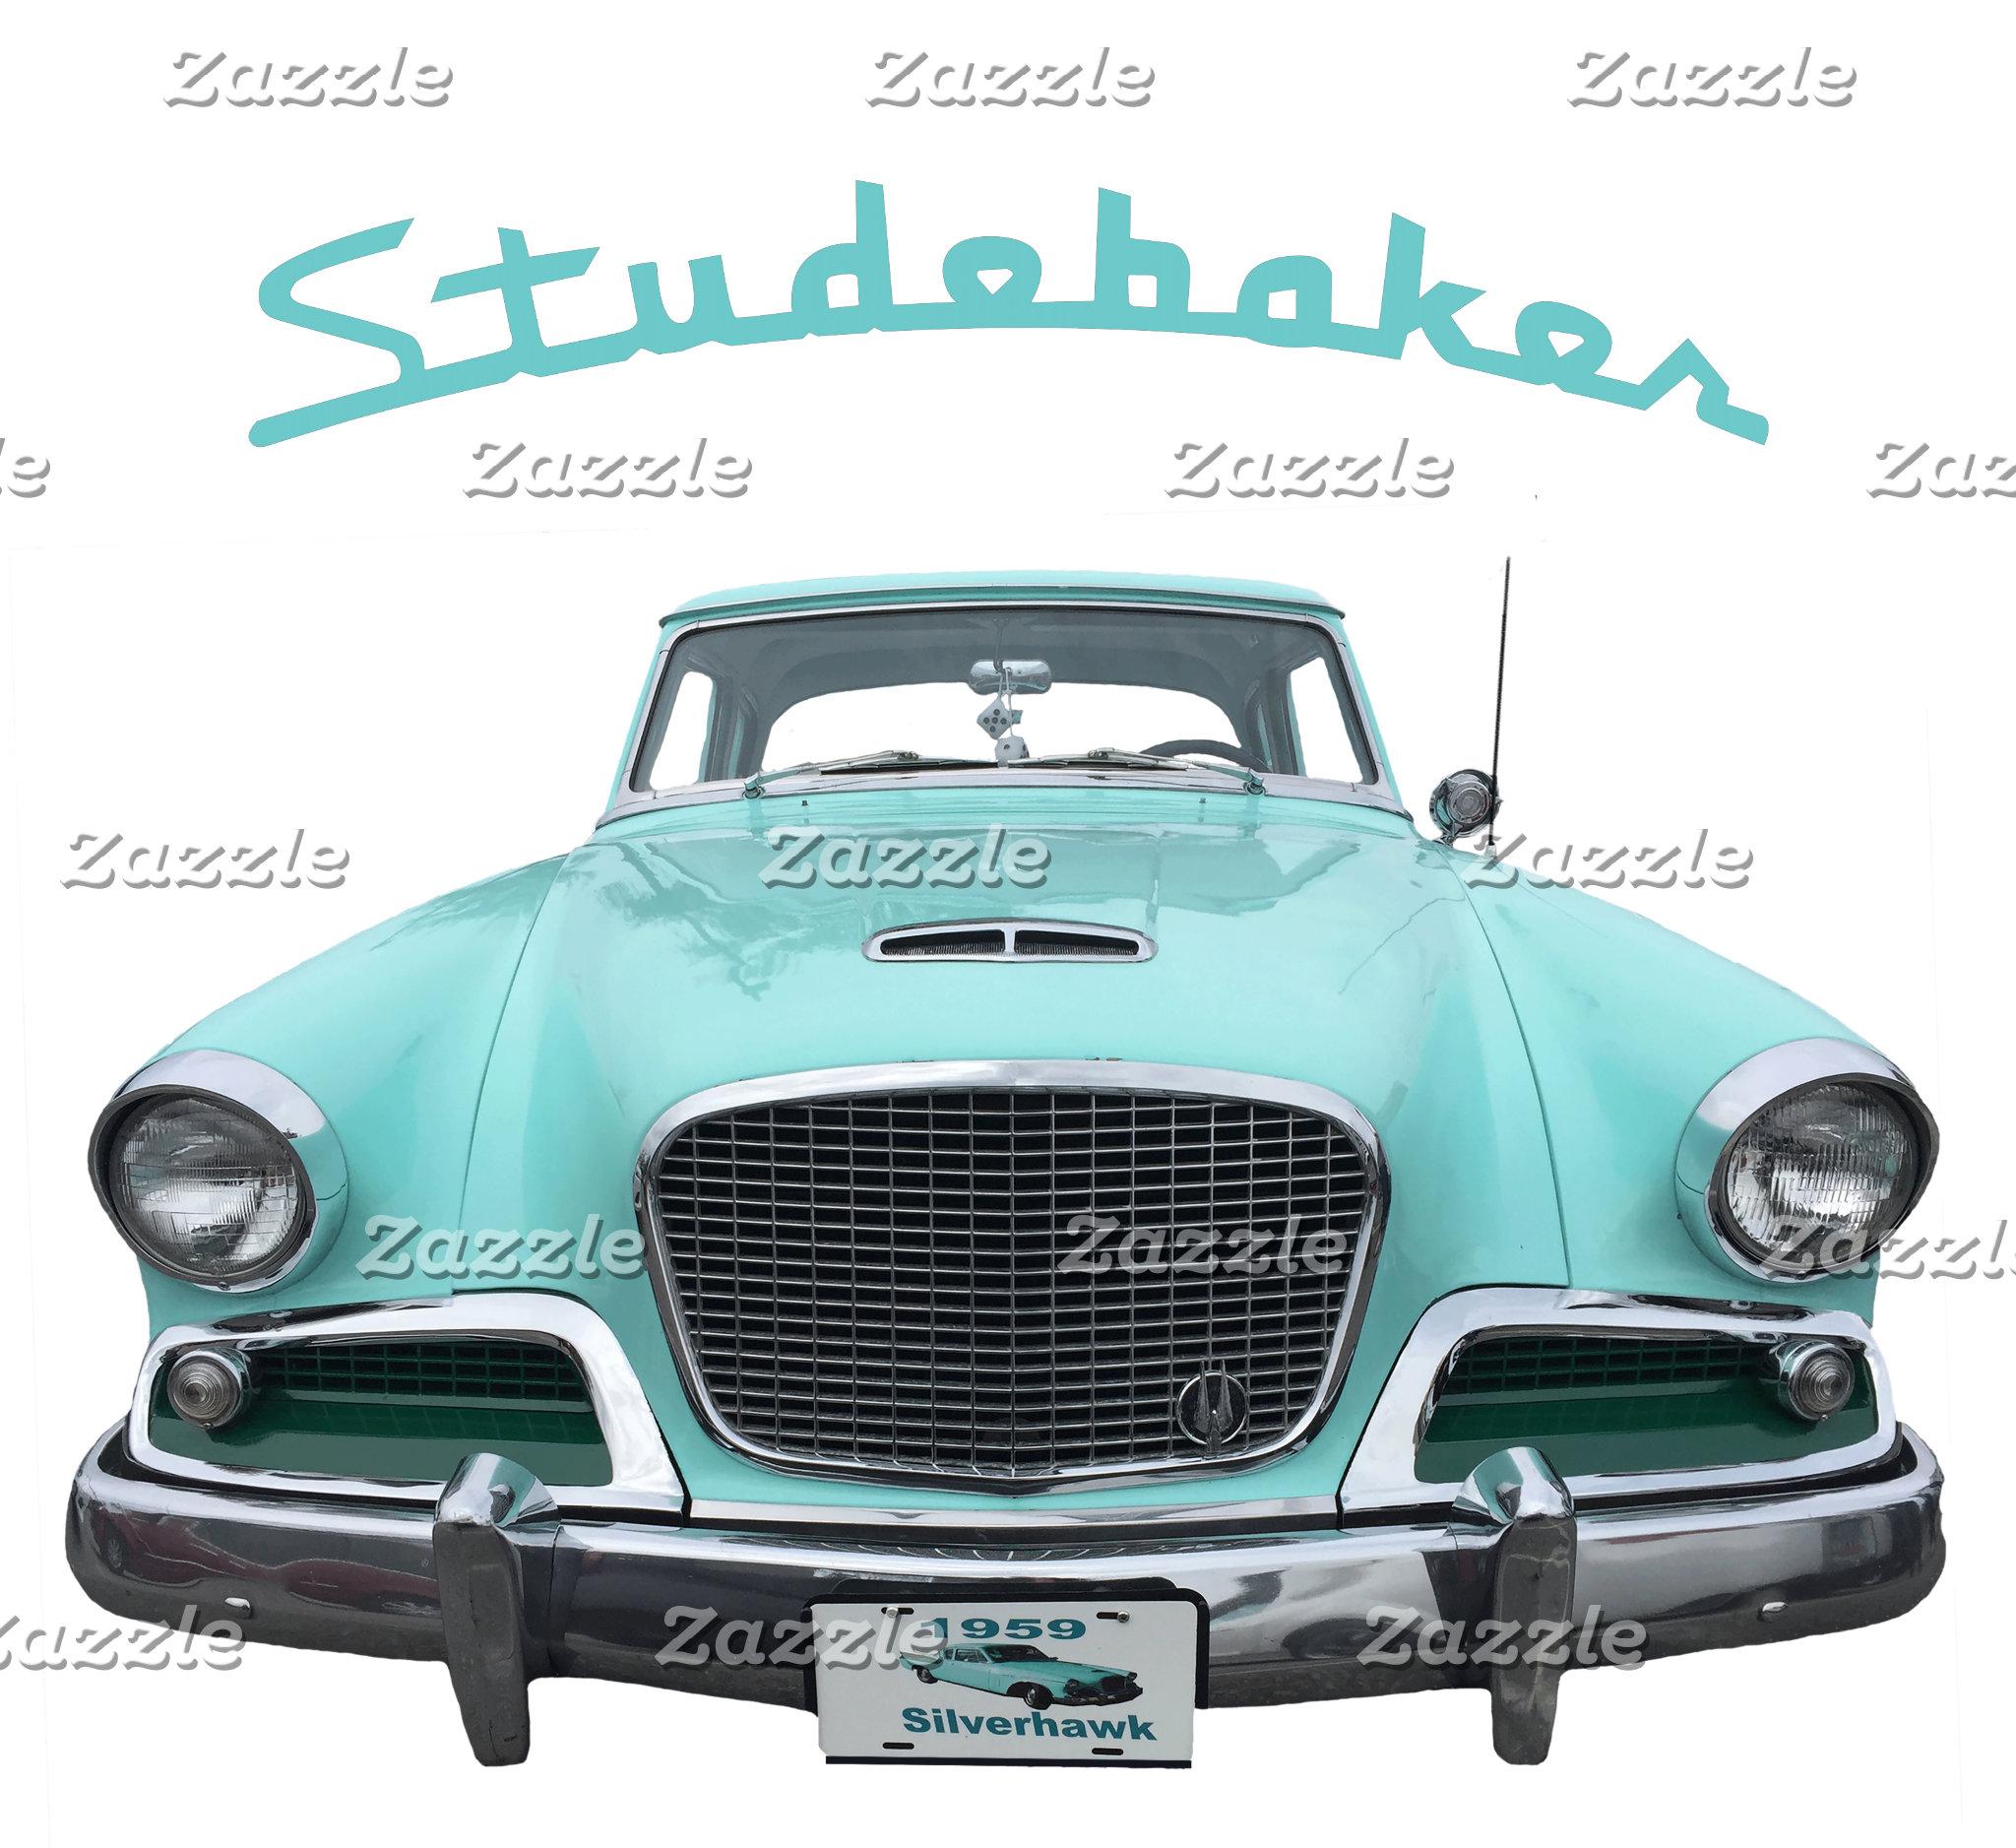 Classic Vintage Studebaker 1959 Silverhawk Car